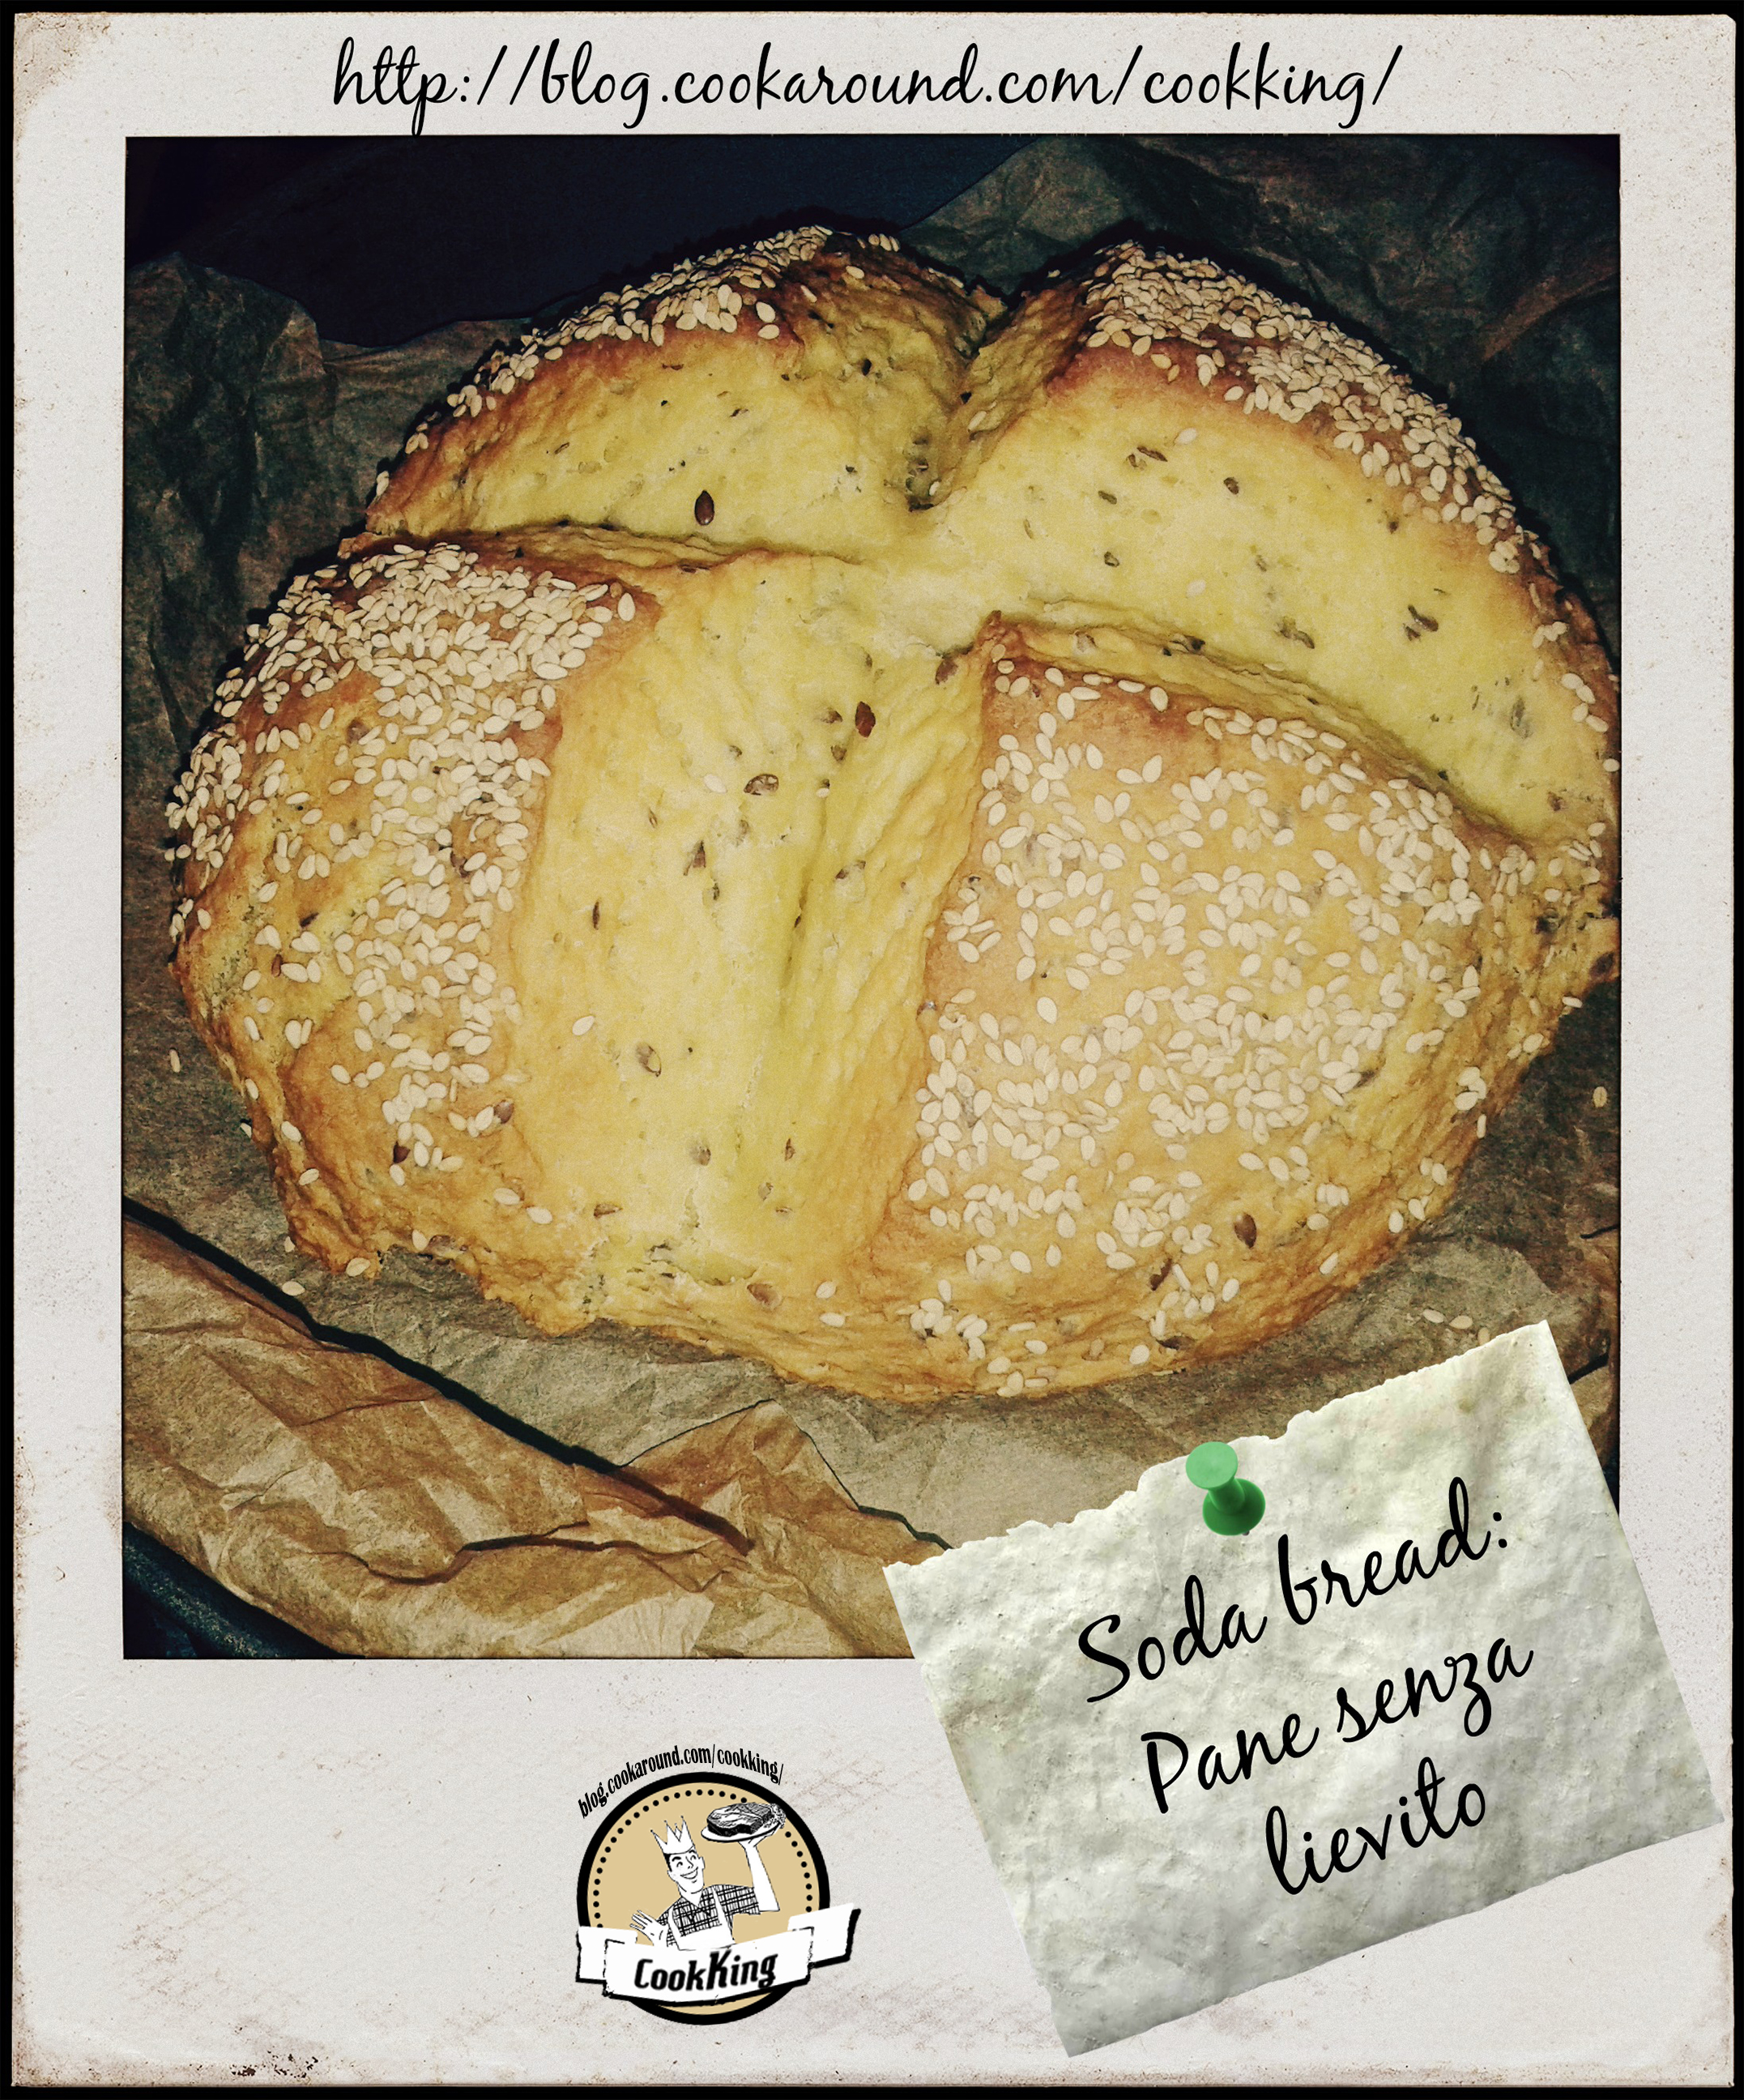 Soda Bread, pane senza lievito - CookKing